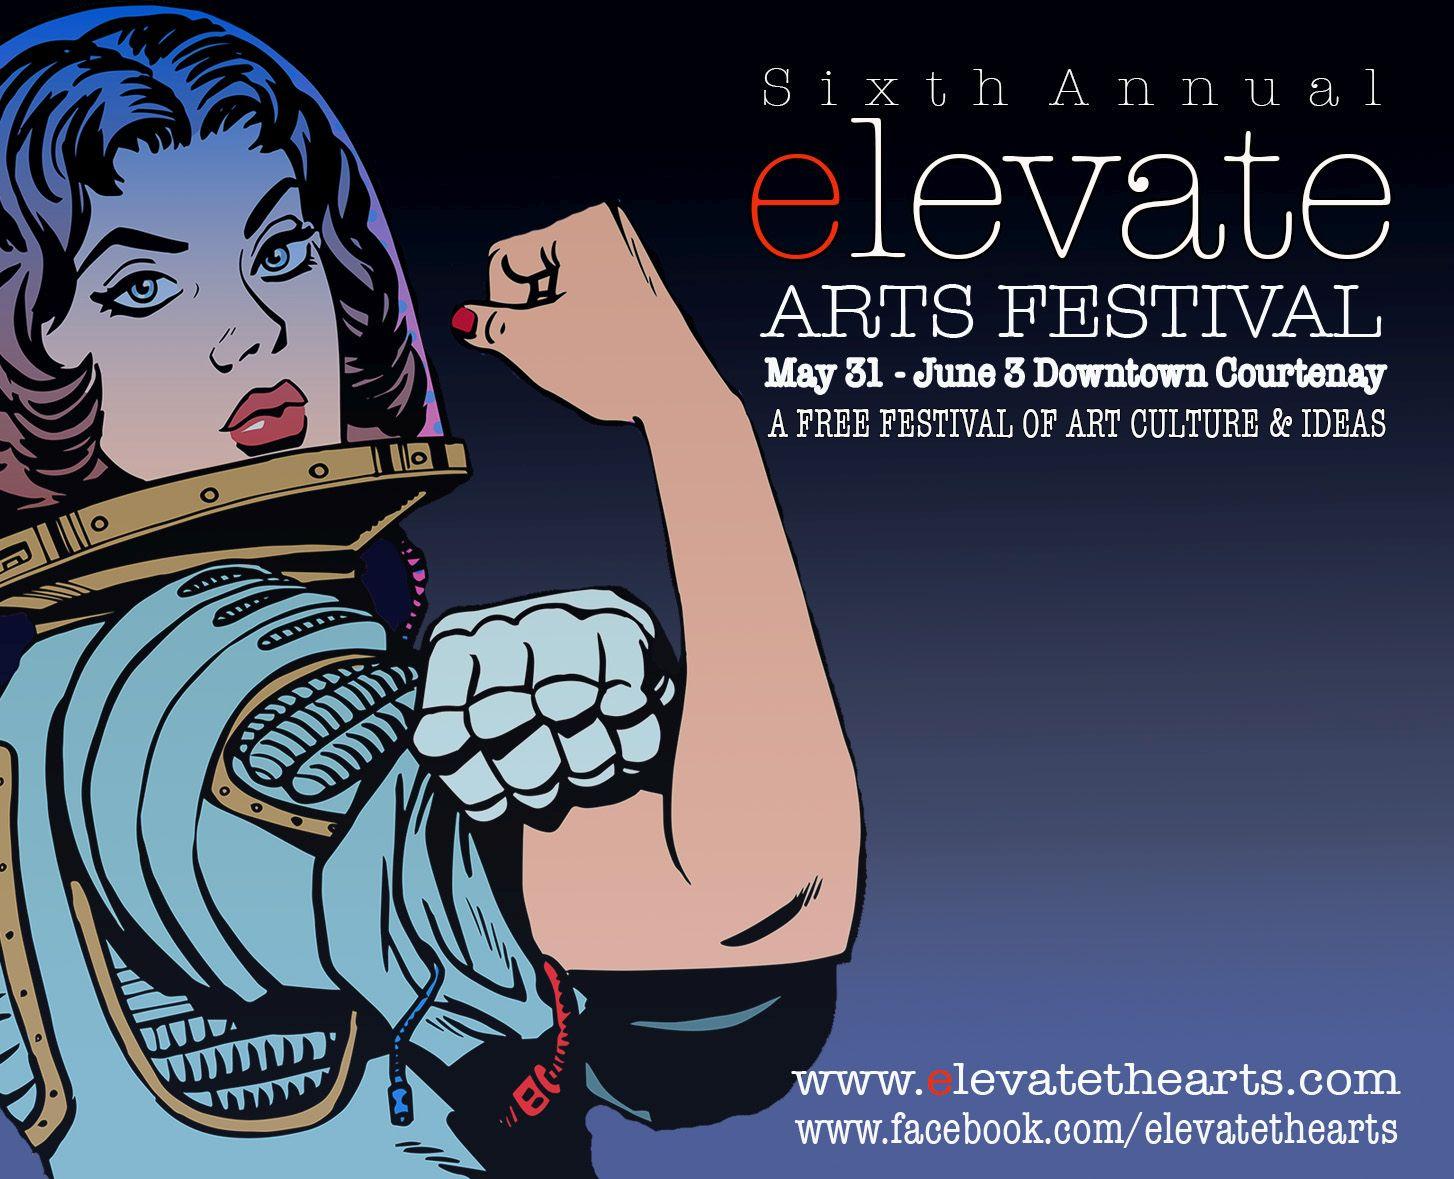 Elevate Arts Festival